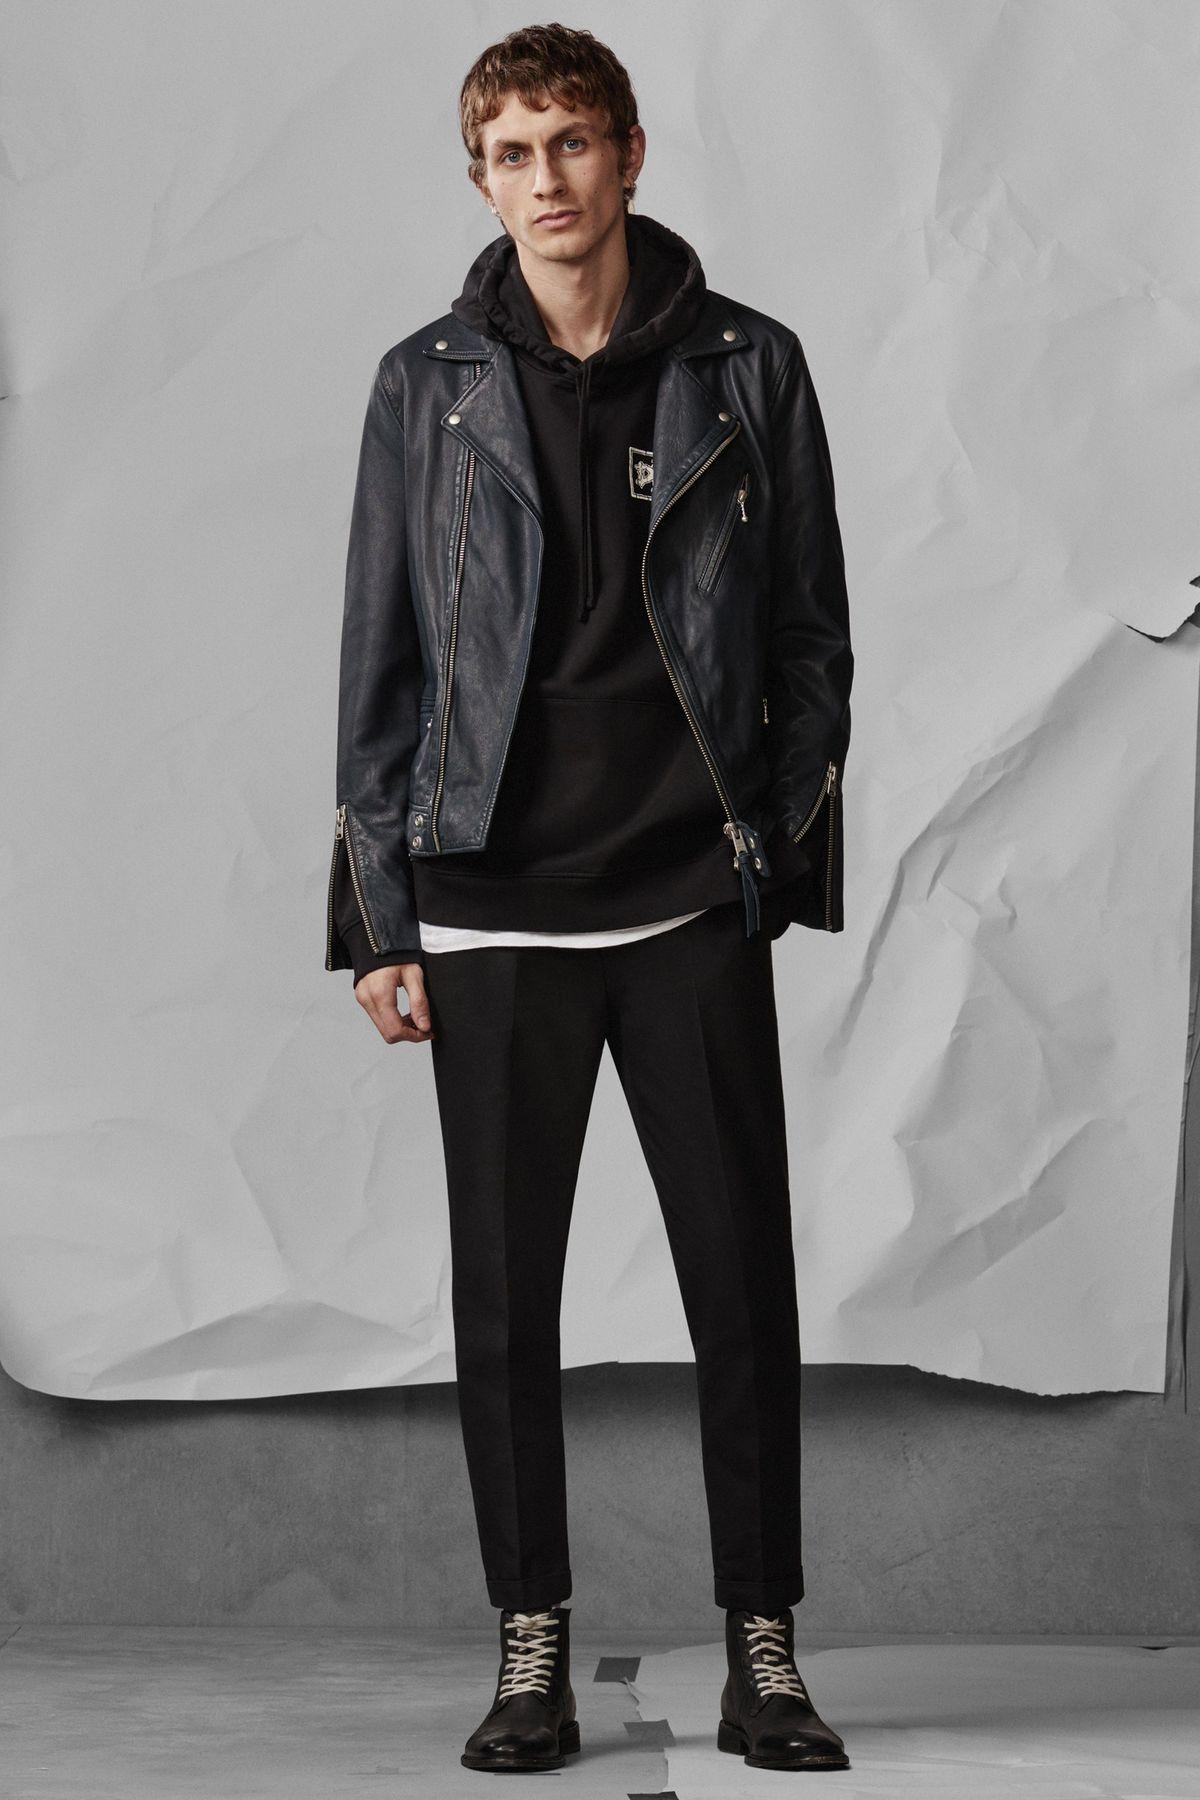 Carver Leather Biker Jacket ,£380  Distroy Hoody , £98  Tallis Trouser , £108  Leven Boot , £168